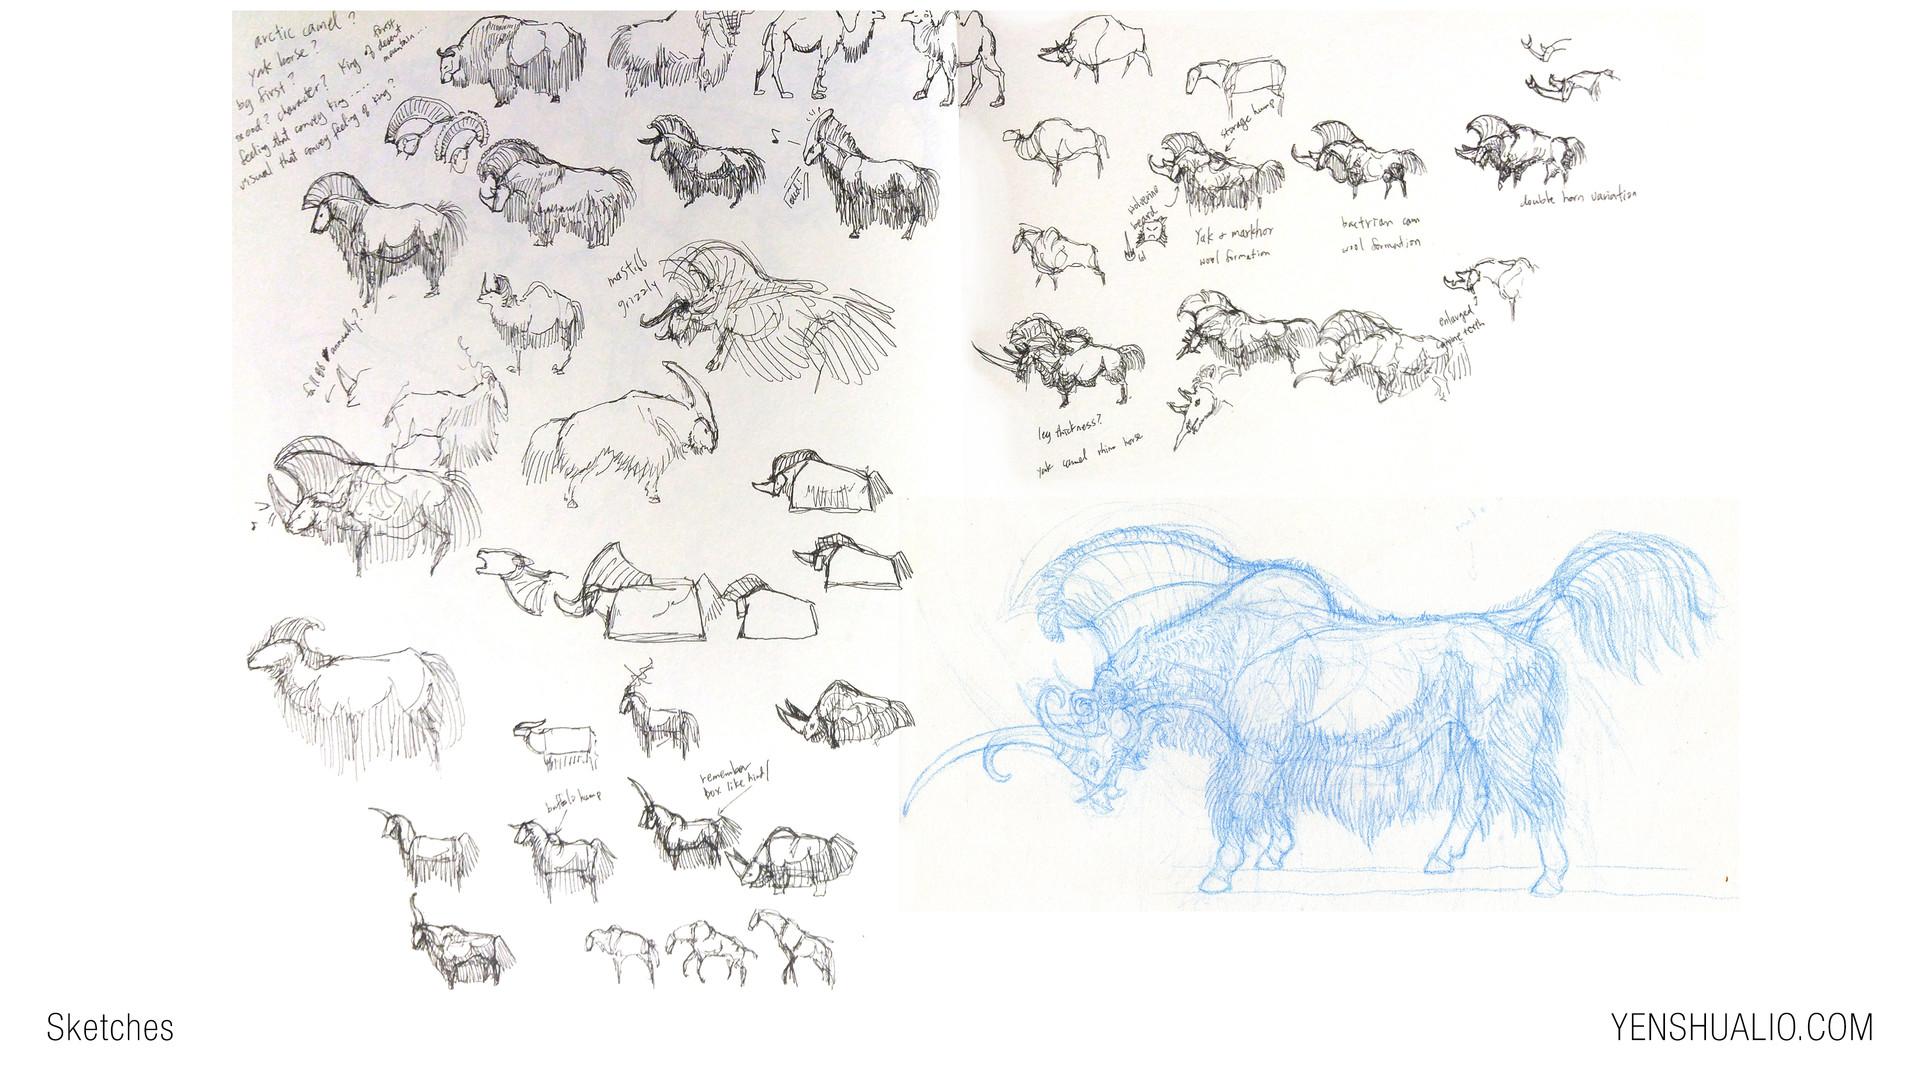 Yen shu liao creature concept art sketch ox